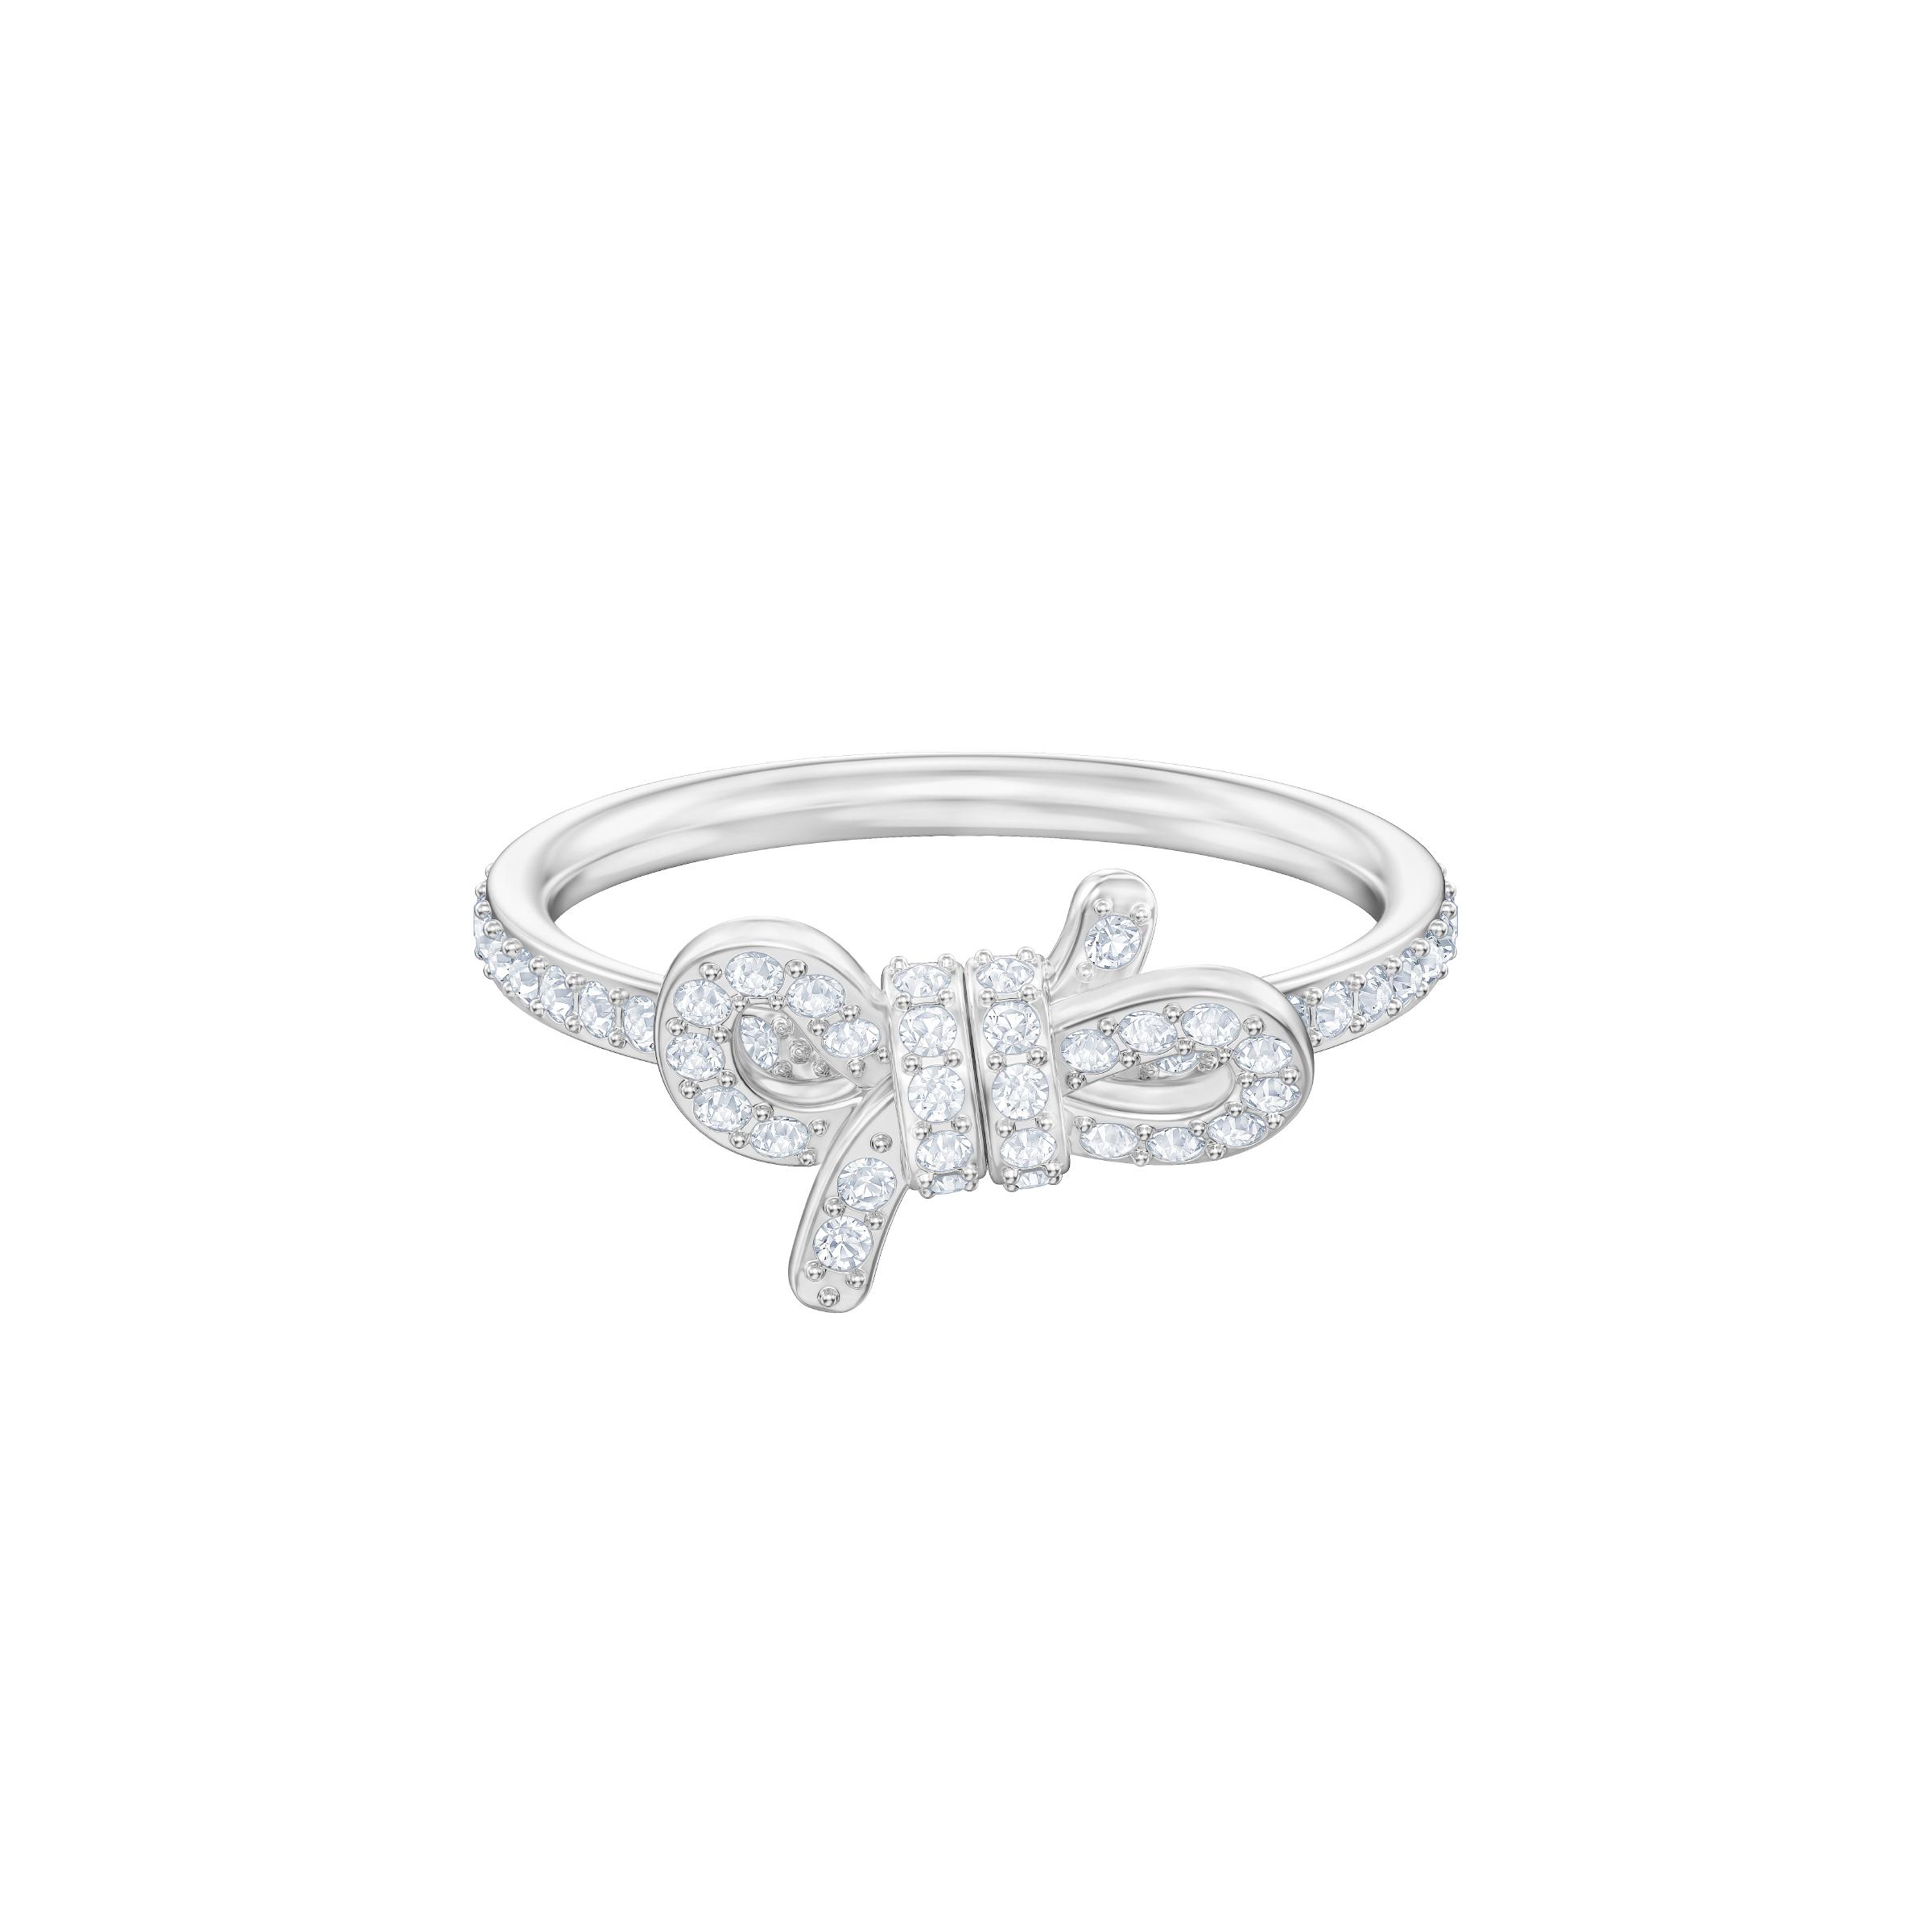 Lifelong Small Bow Ring, White, Rhodium plating